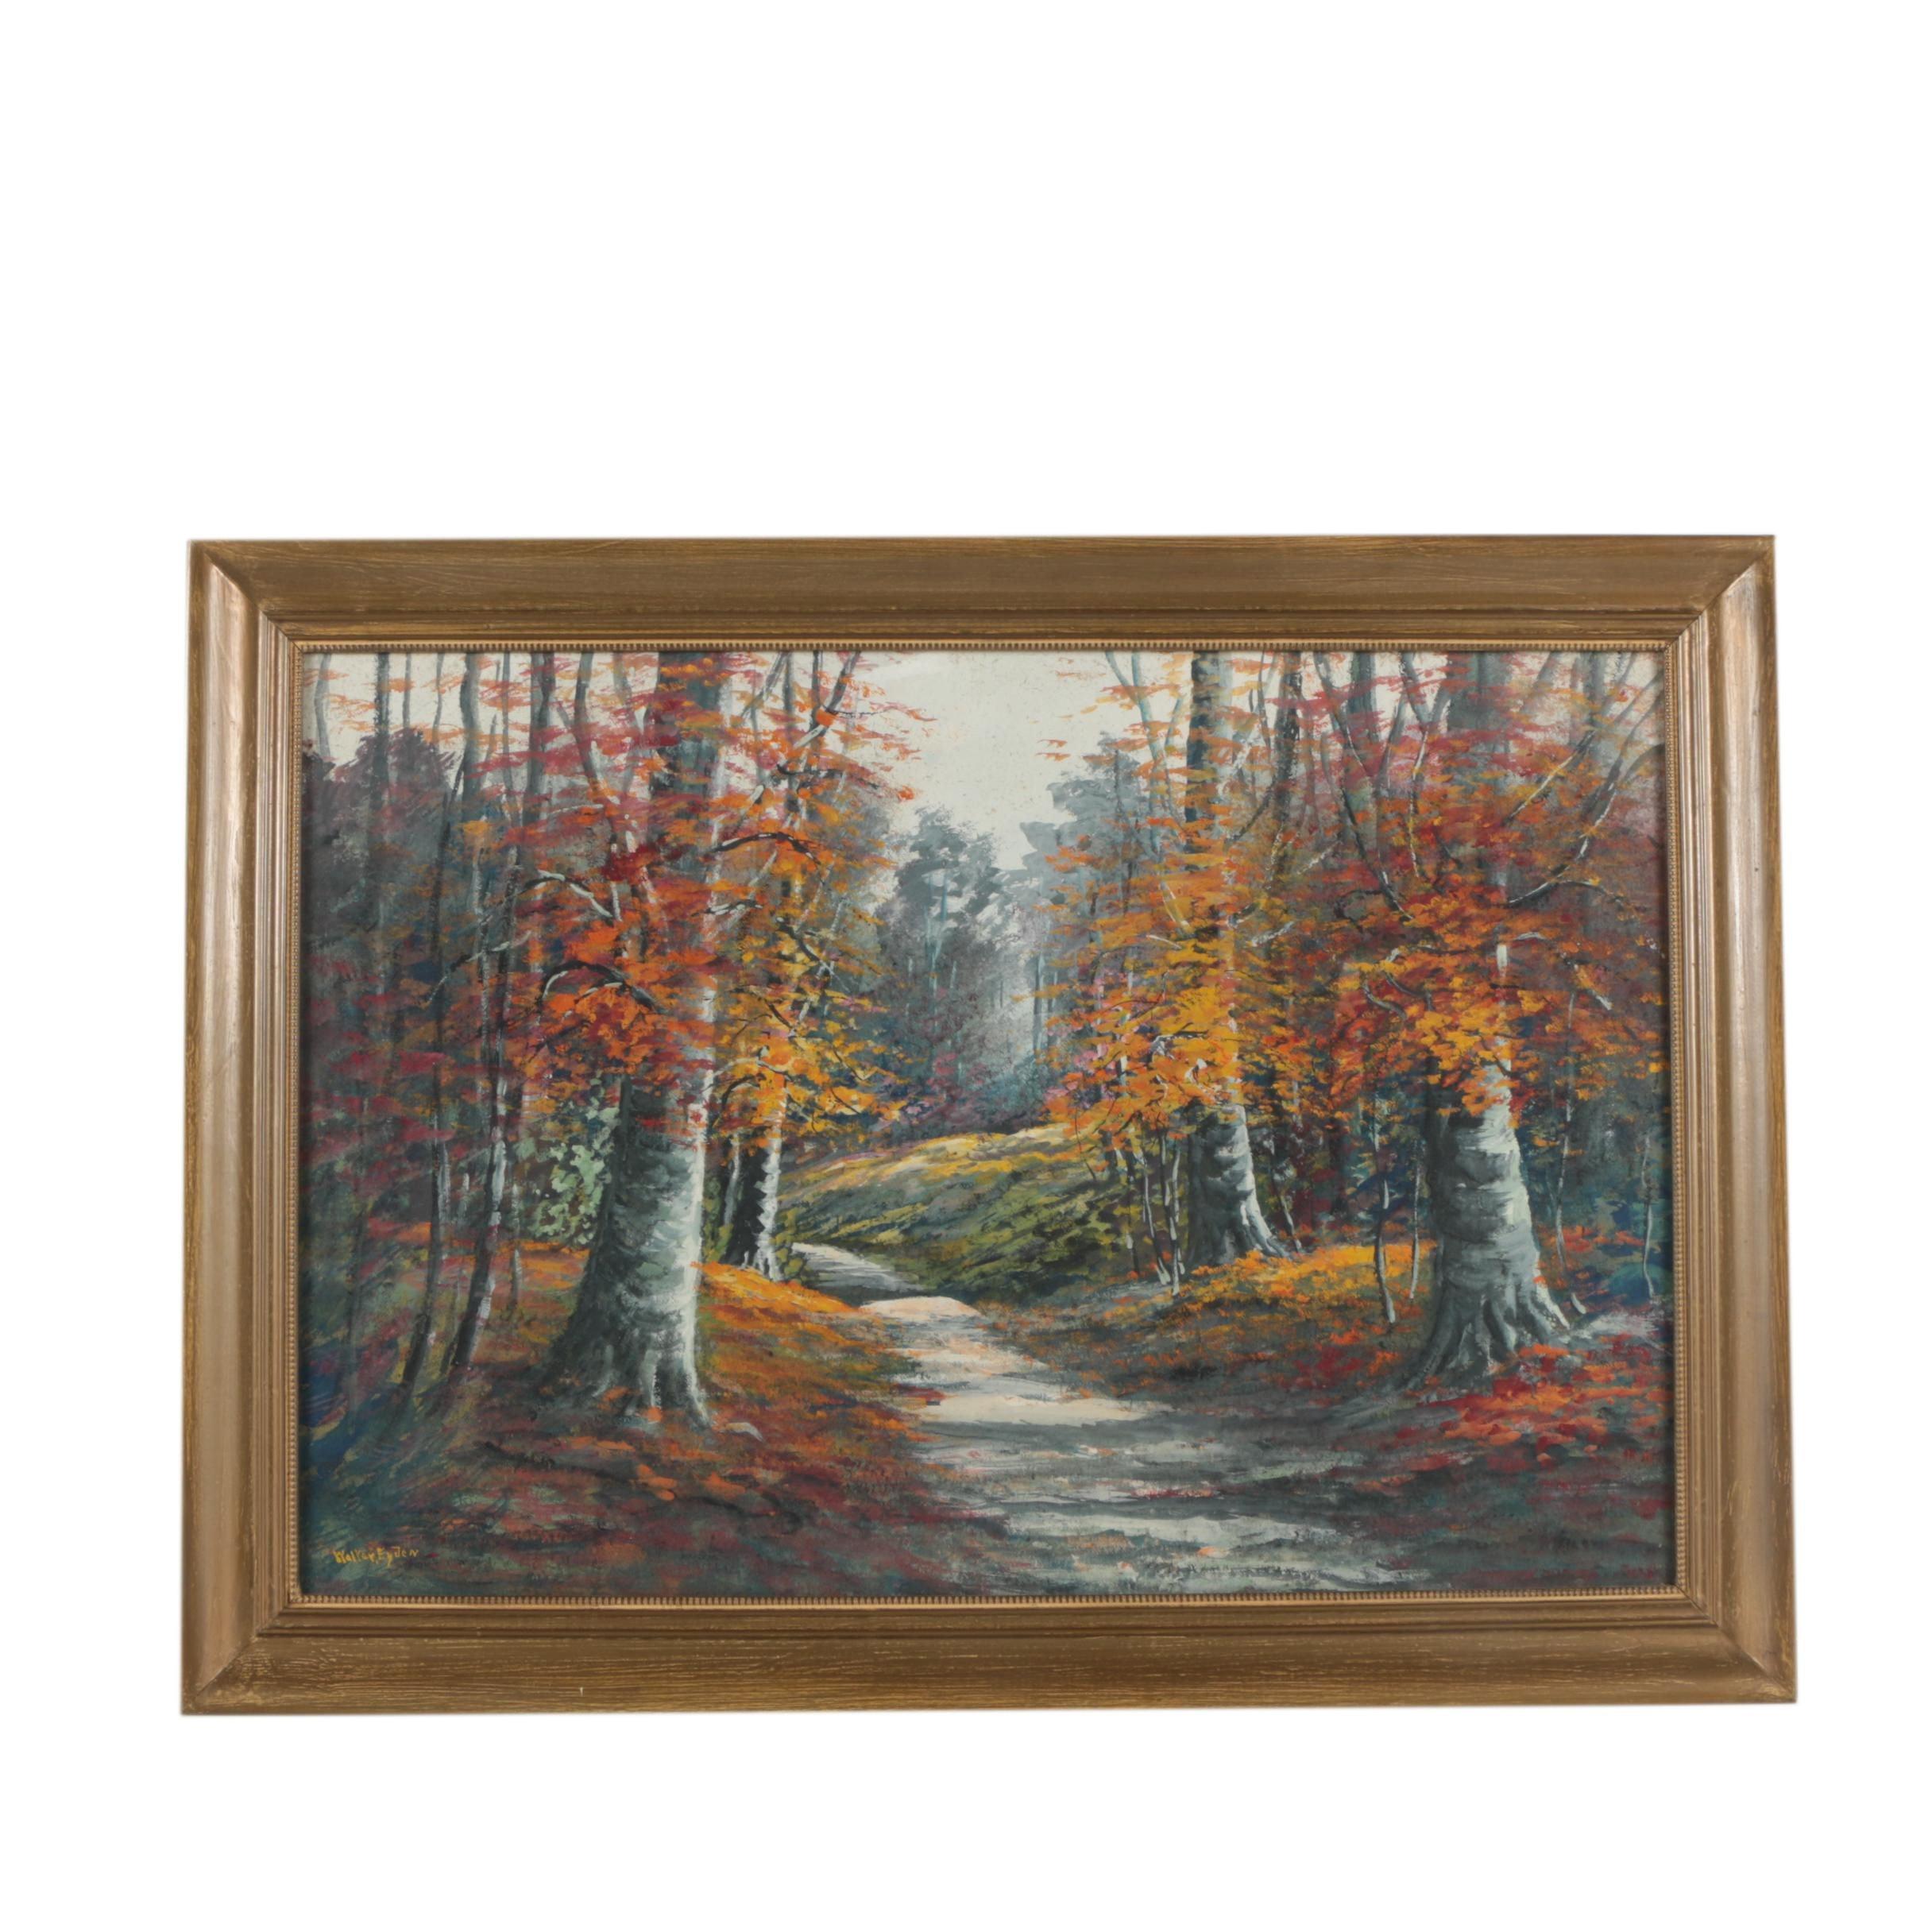 Walter Eyden Oil Landscape Painting